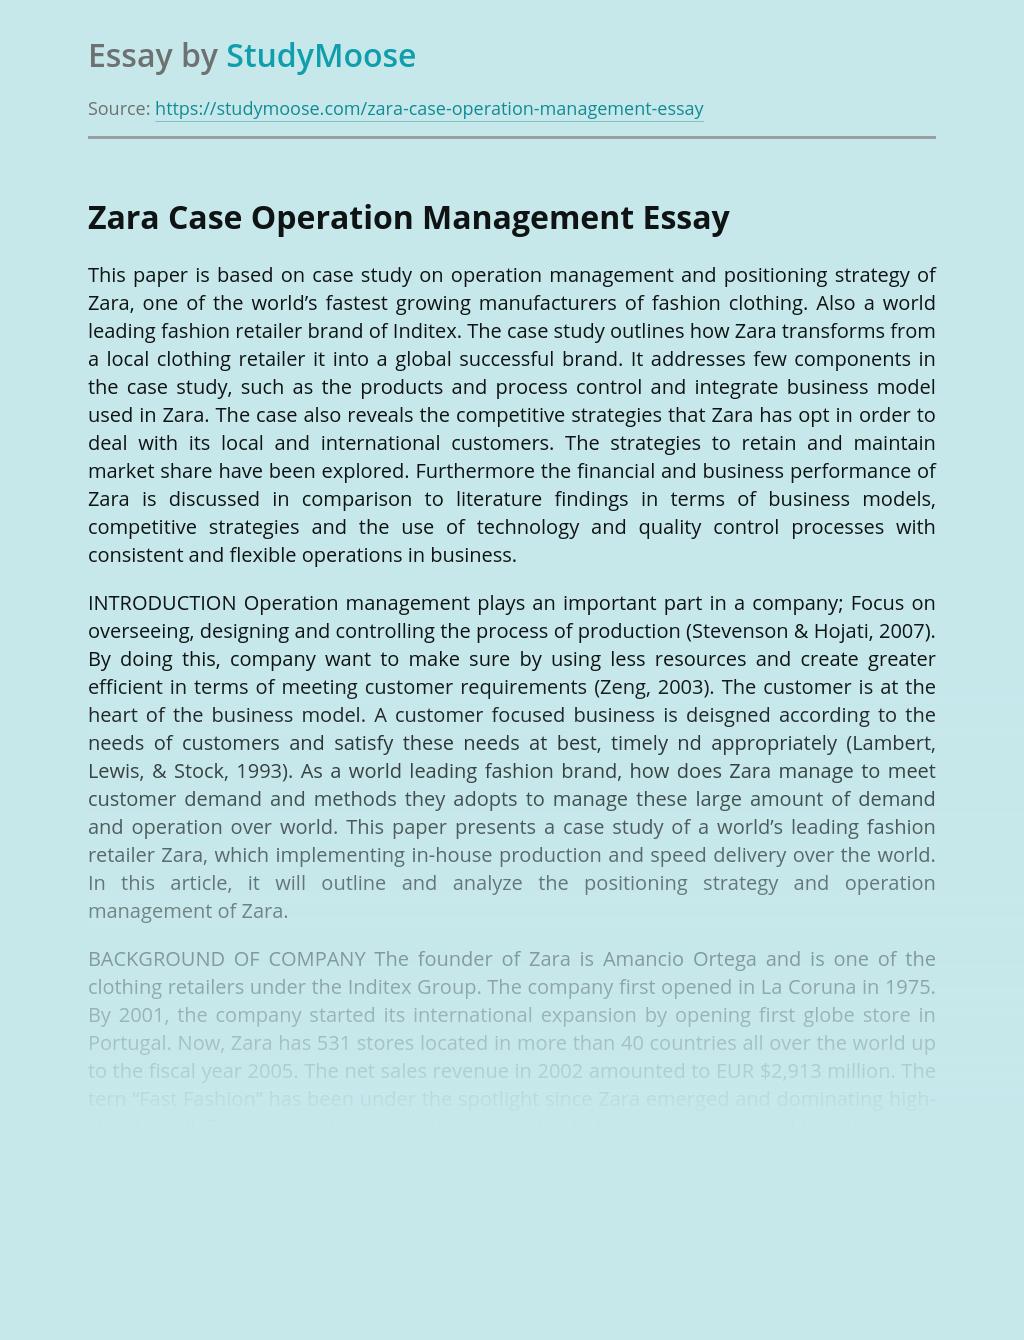 Zara Case Operation Management